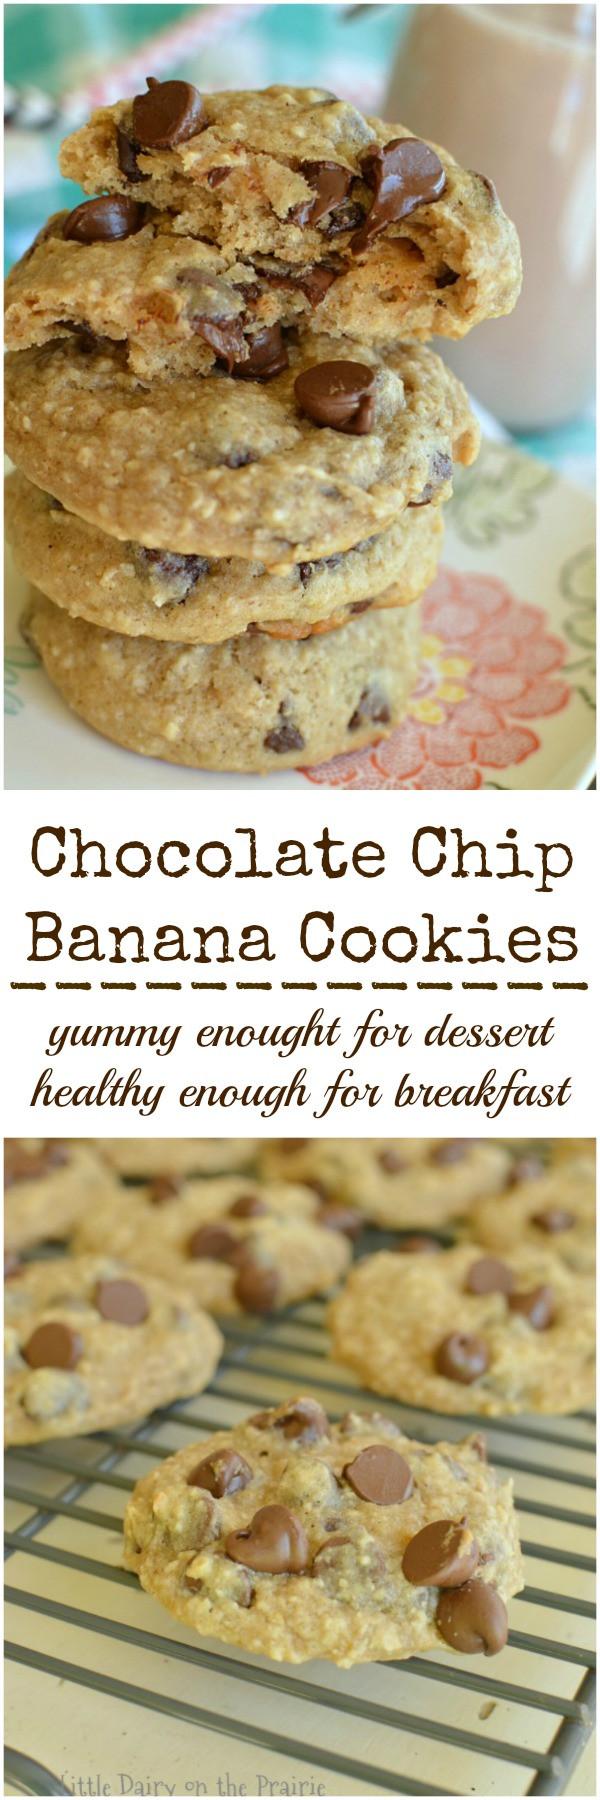 Banana Bread Cookies Healthy  Healthy Chocolate Chip Banana Cookies Little Dairy